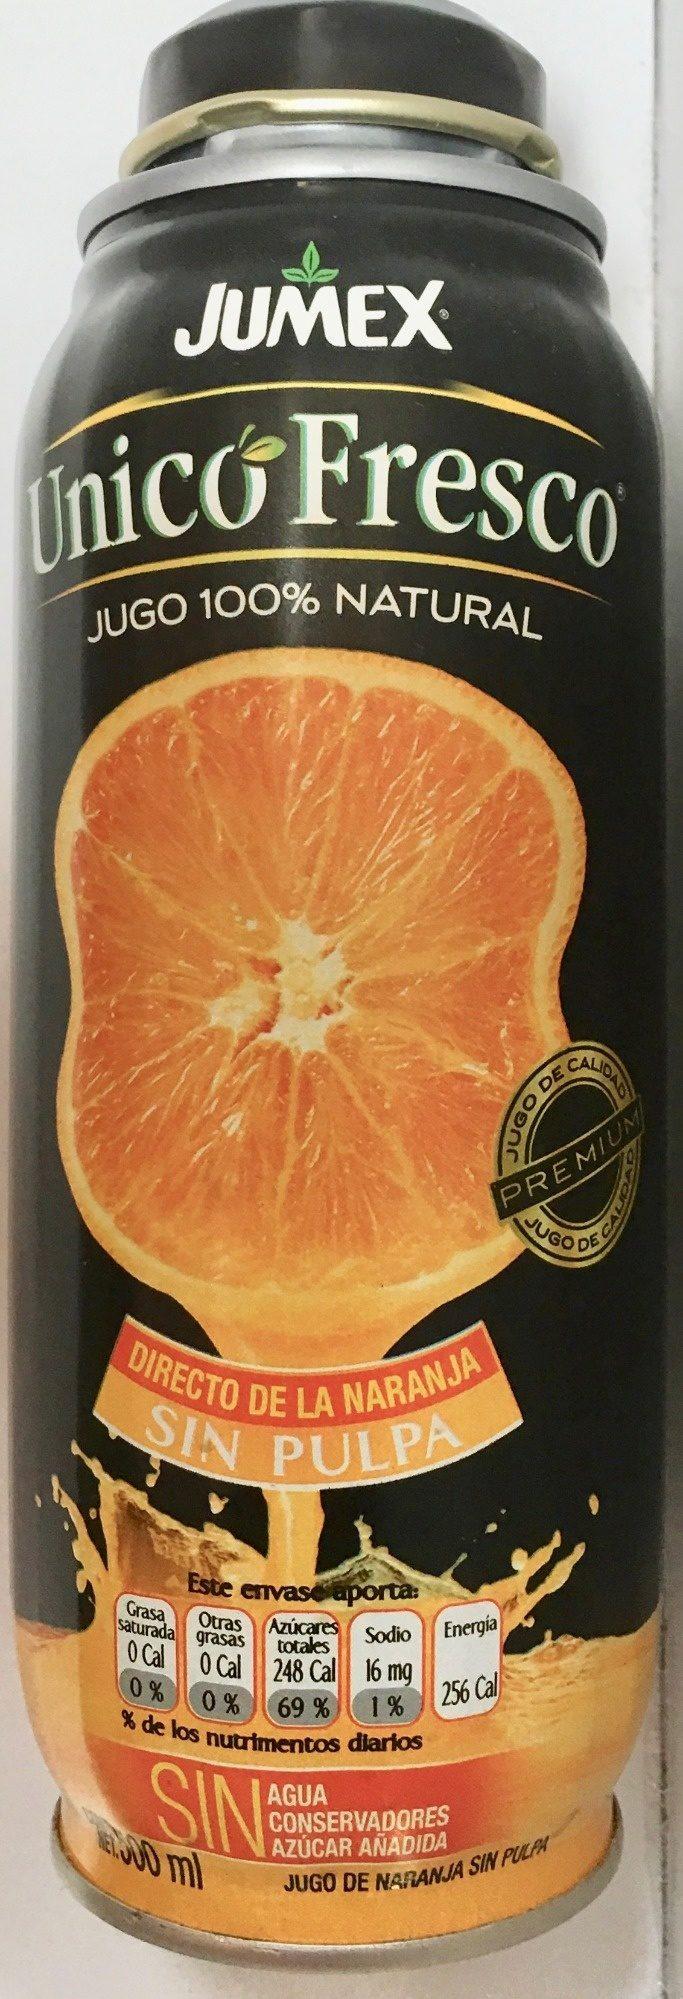 Jumex Unico Fresco Naranja 100% natural - Product - es